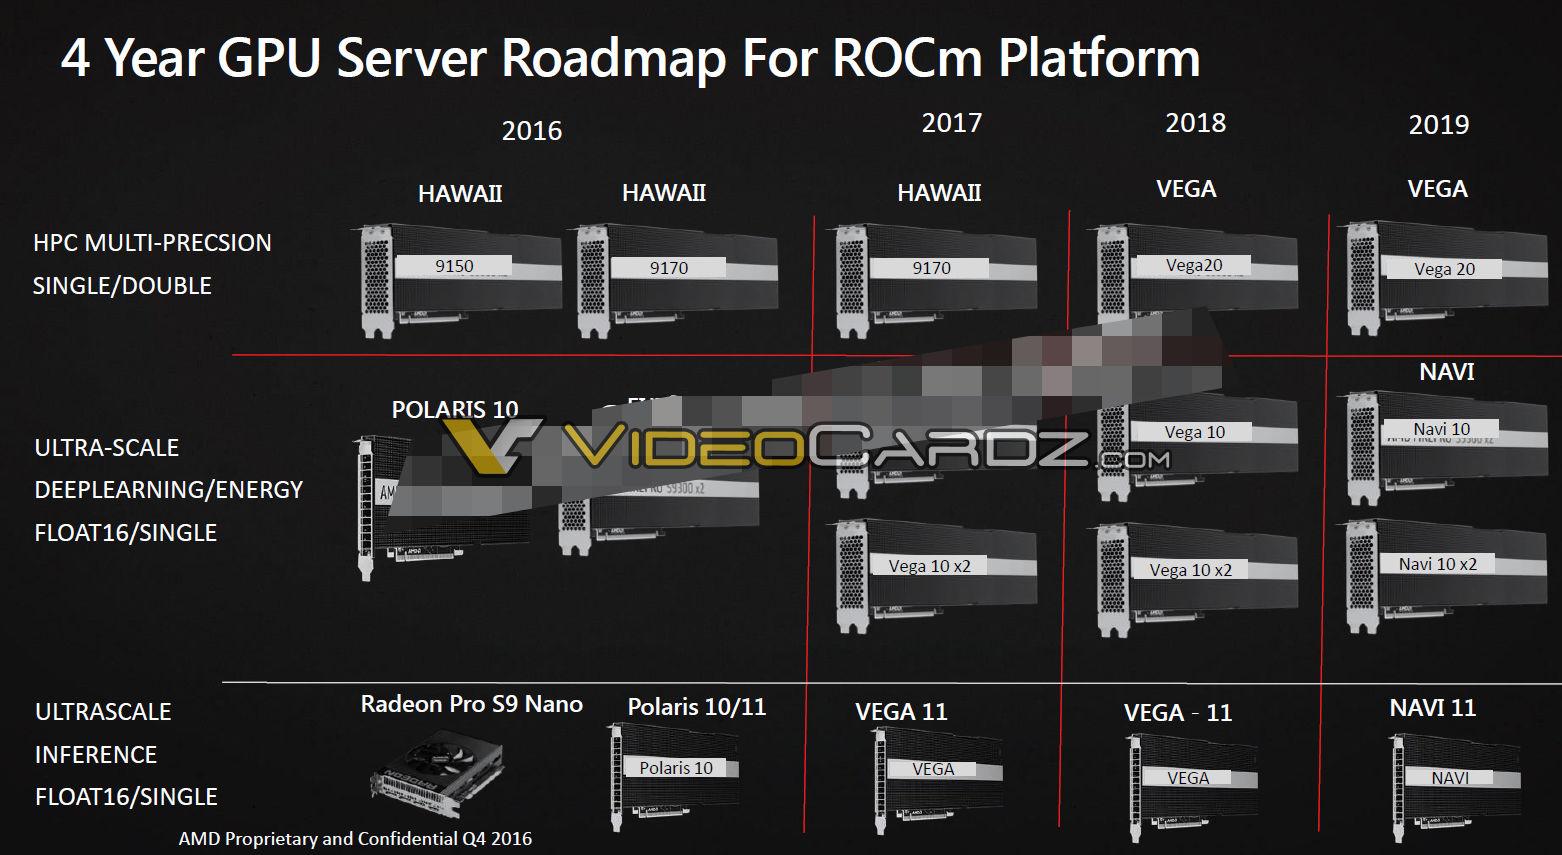 https://cdn.videocardz.com/1/2017/01/AMD-VEGA-10-VEGA20-VEGA-11-NAVI-roadmap.jpg